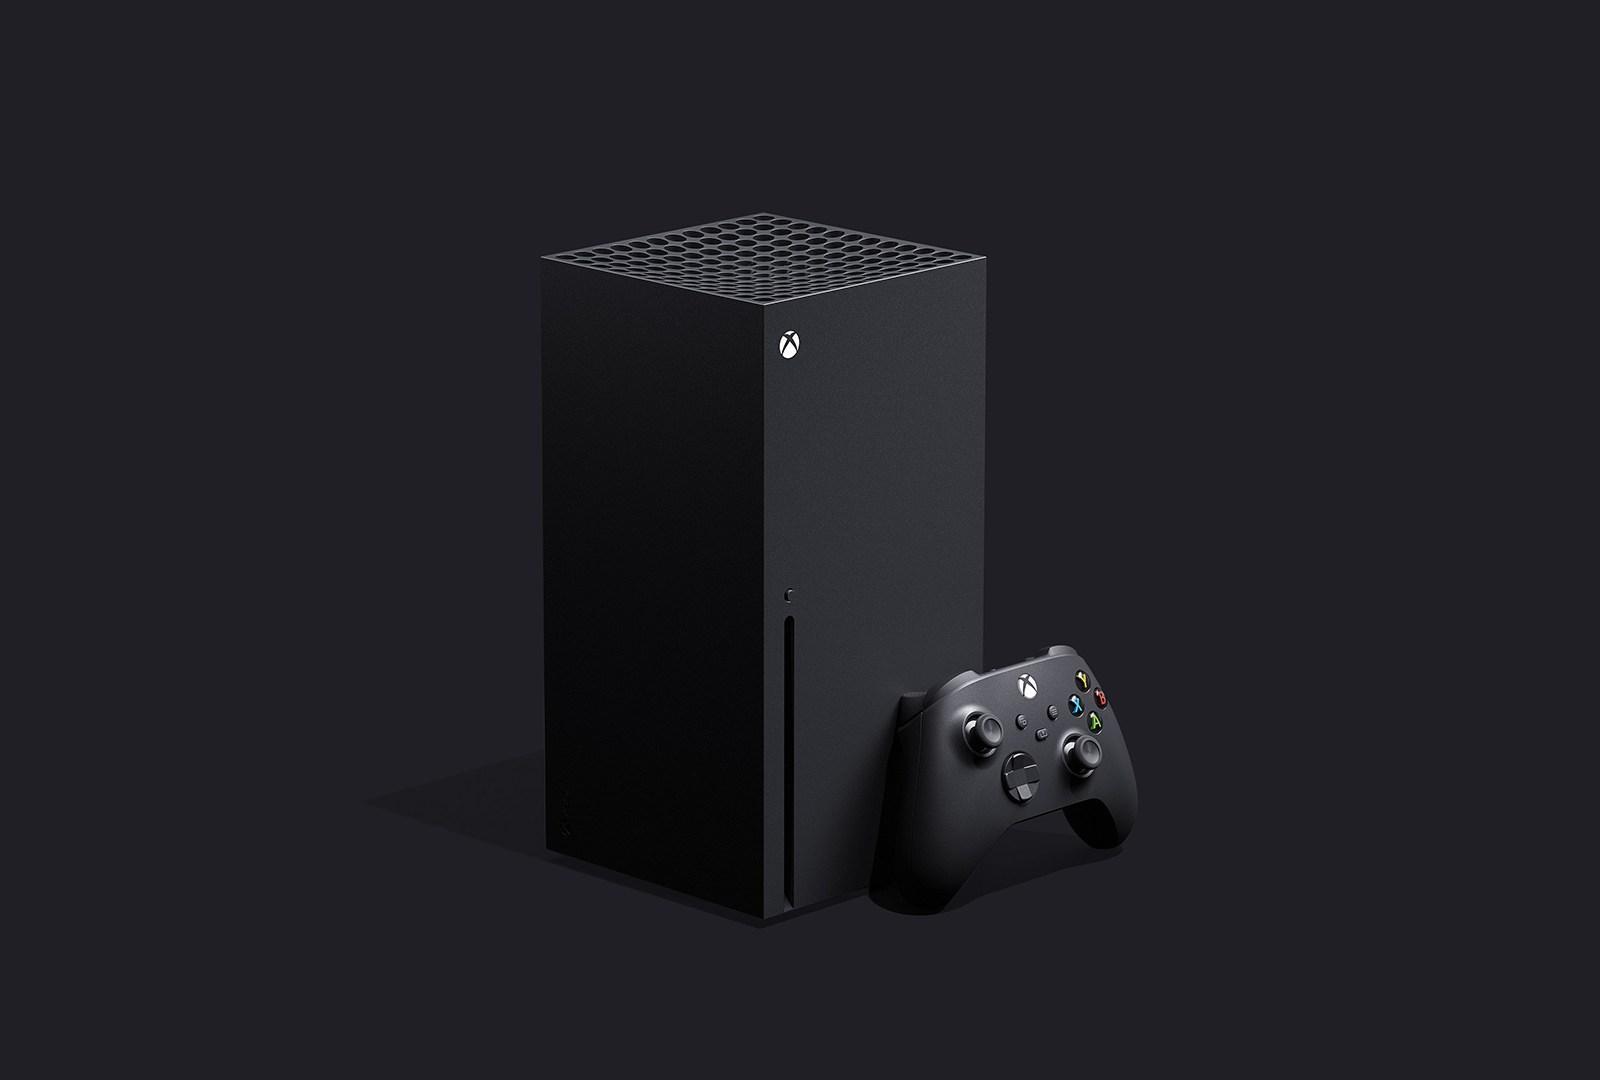 Xbox Series X console (source: Microsoft)